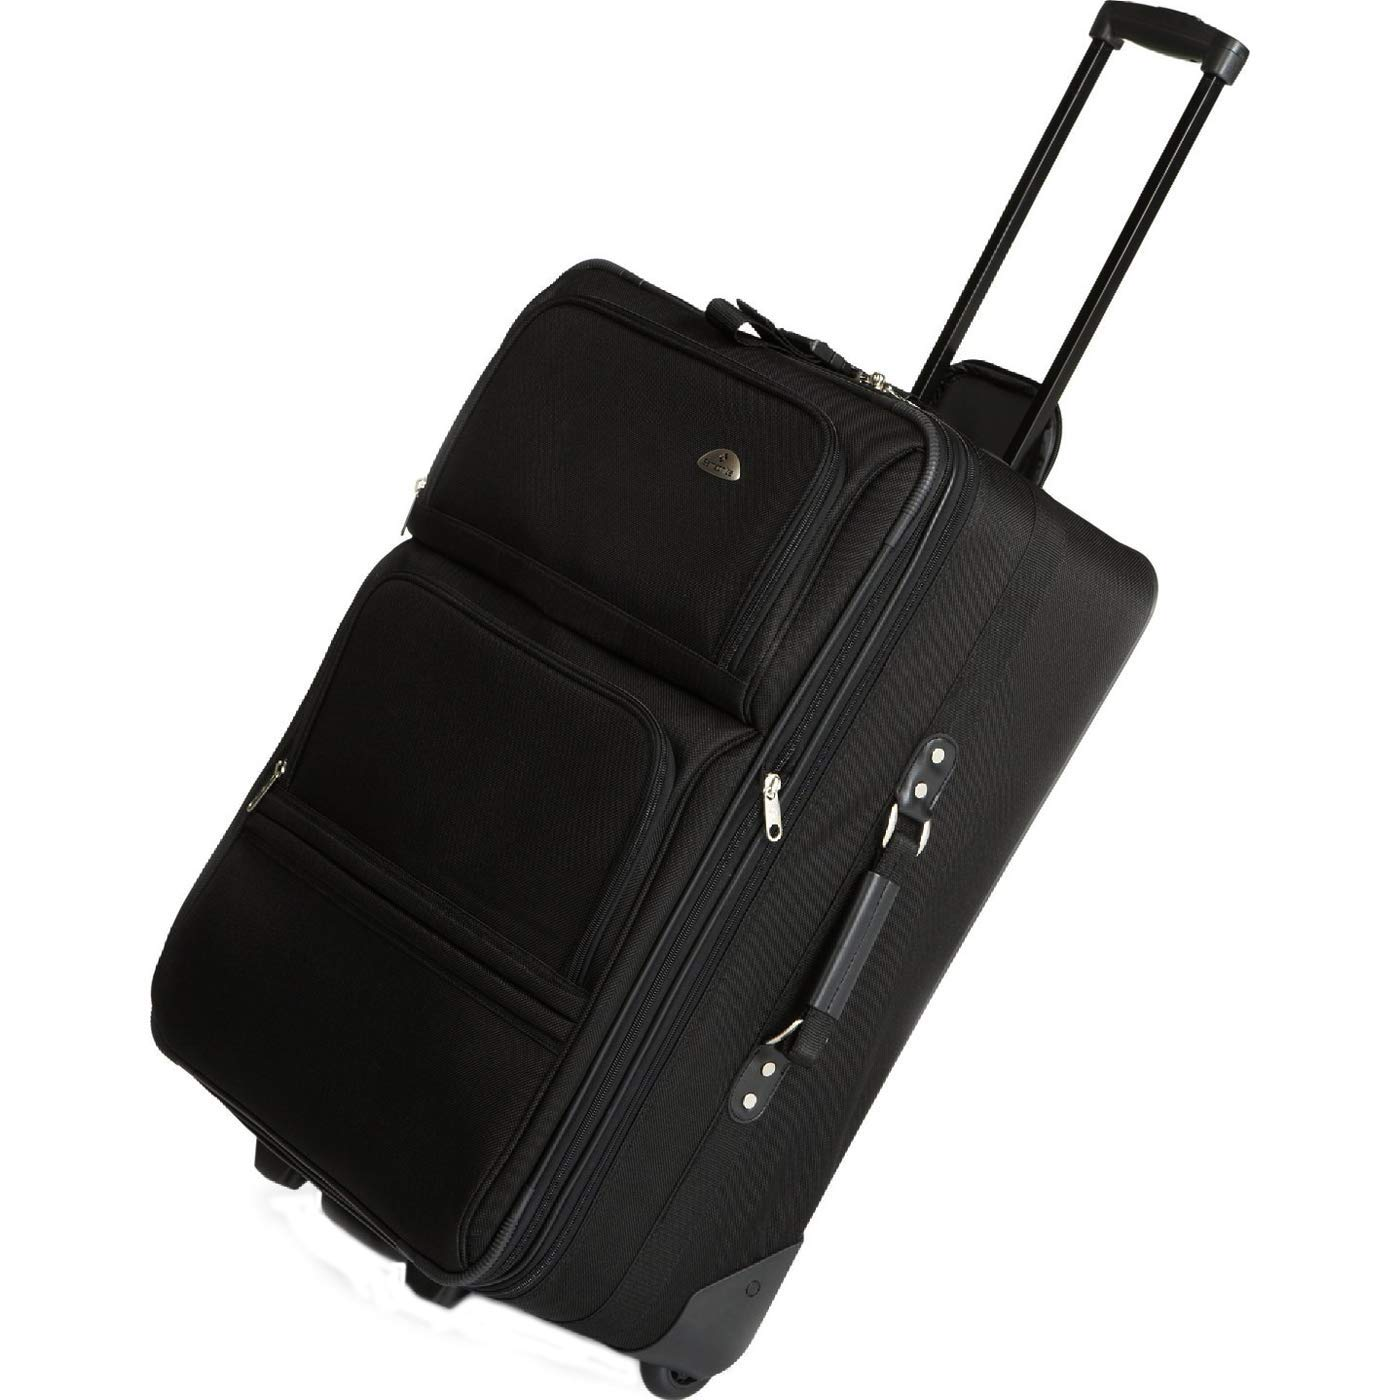 Samsonite 5 Piece Nested Luggage Set, Black